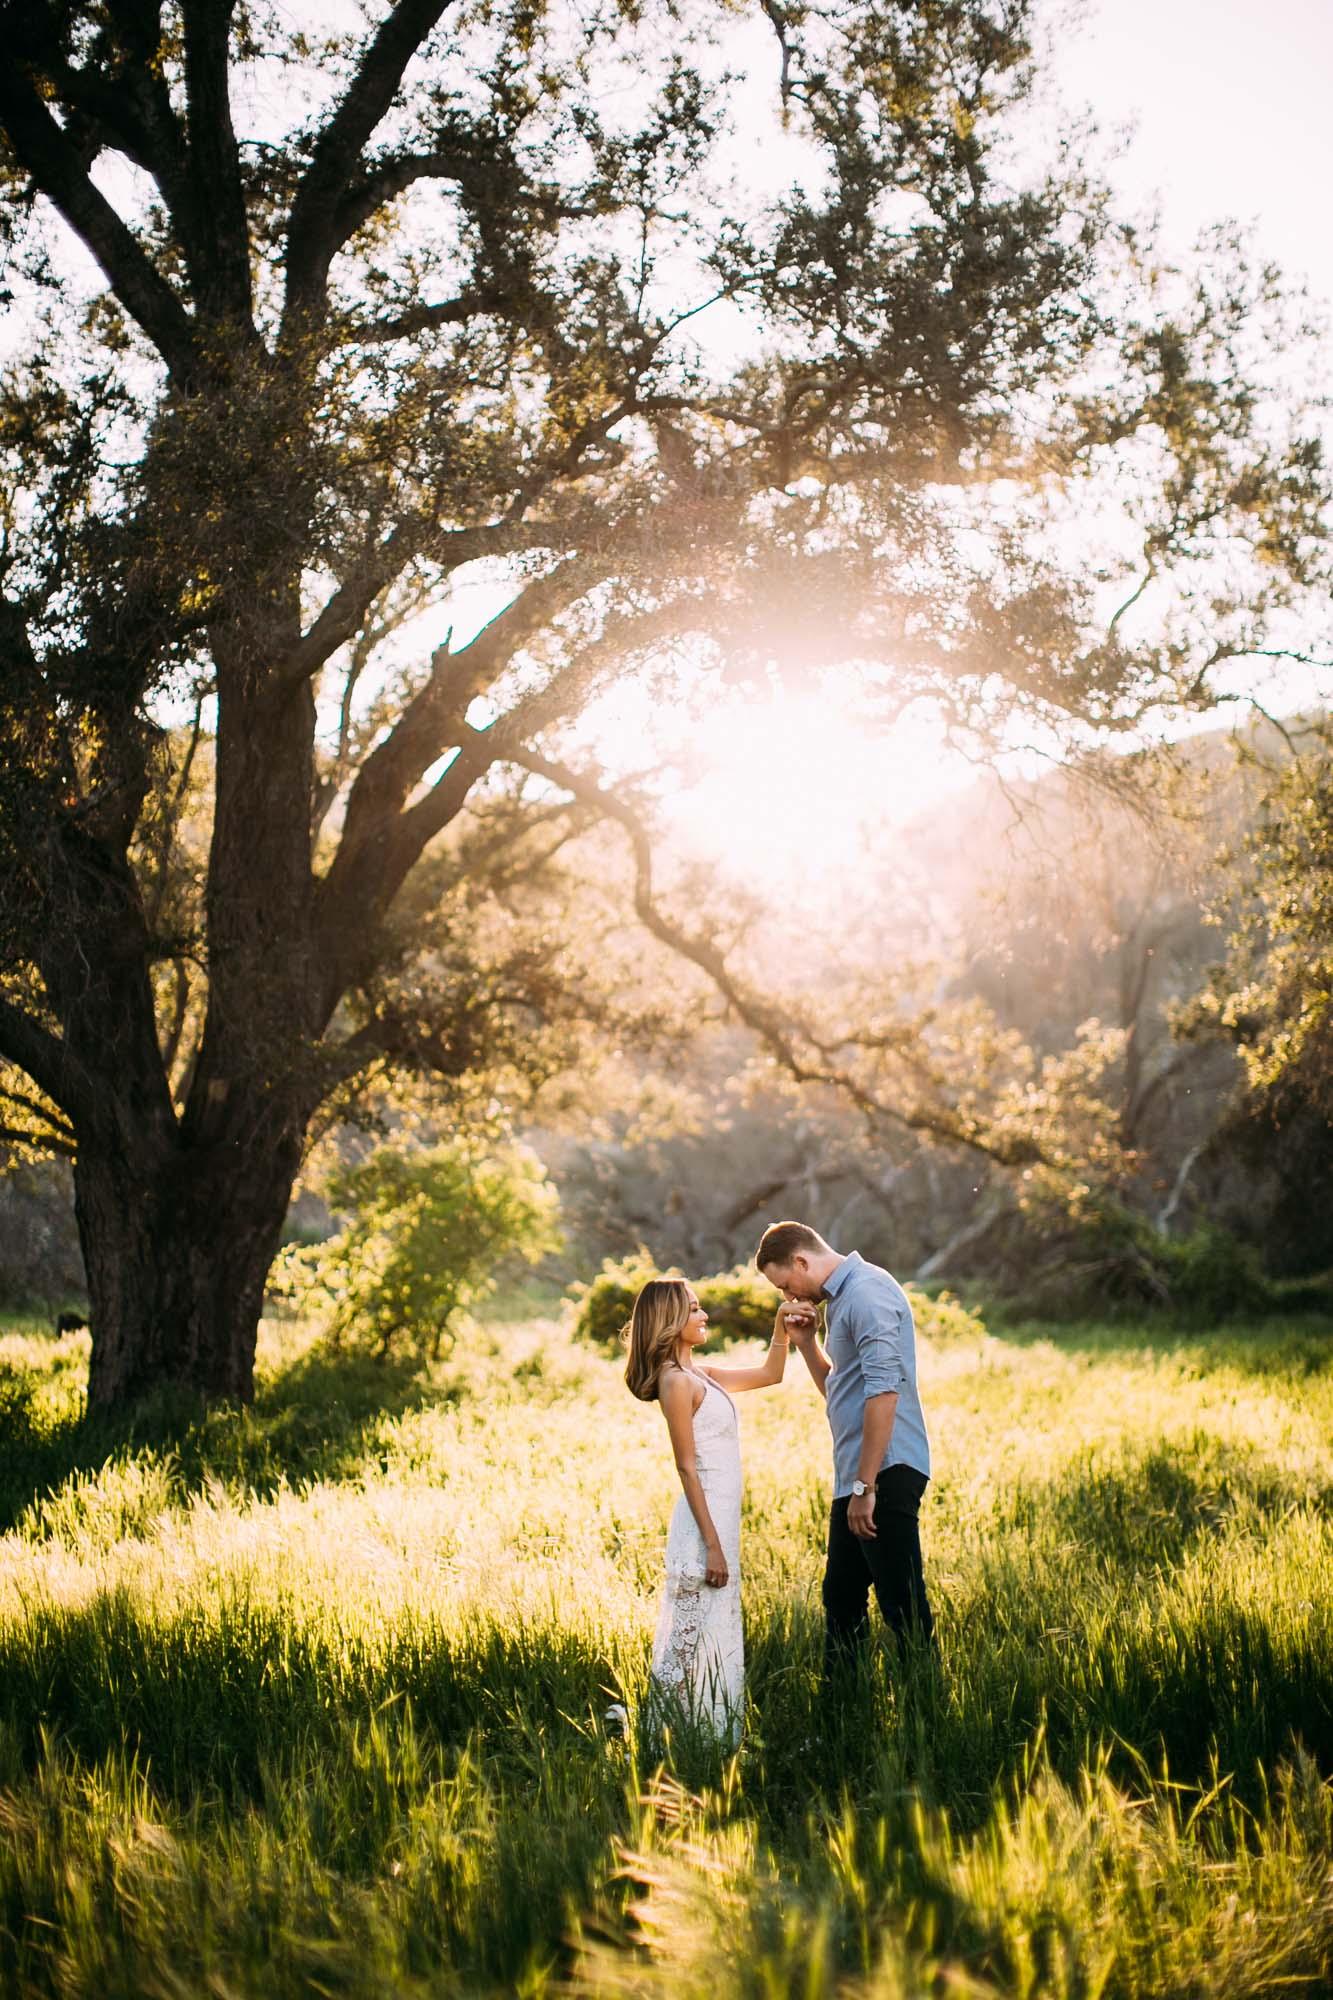 2017.3.11_Caspers-Park_Orange-County-Engagement-Sarah-Mack-Photo  129.jpg